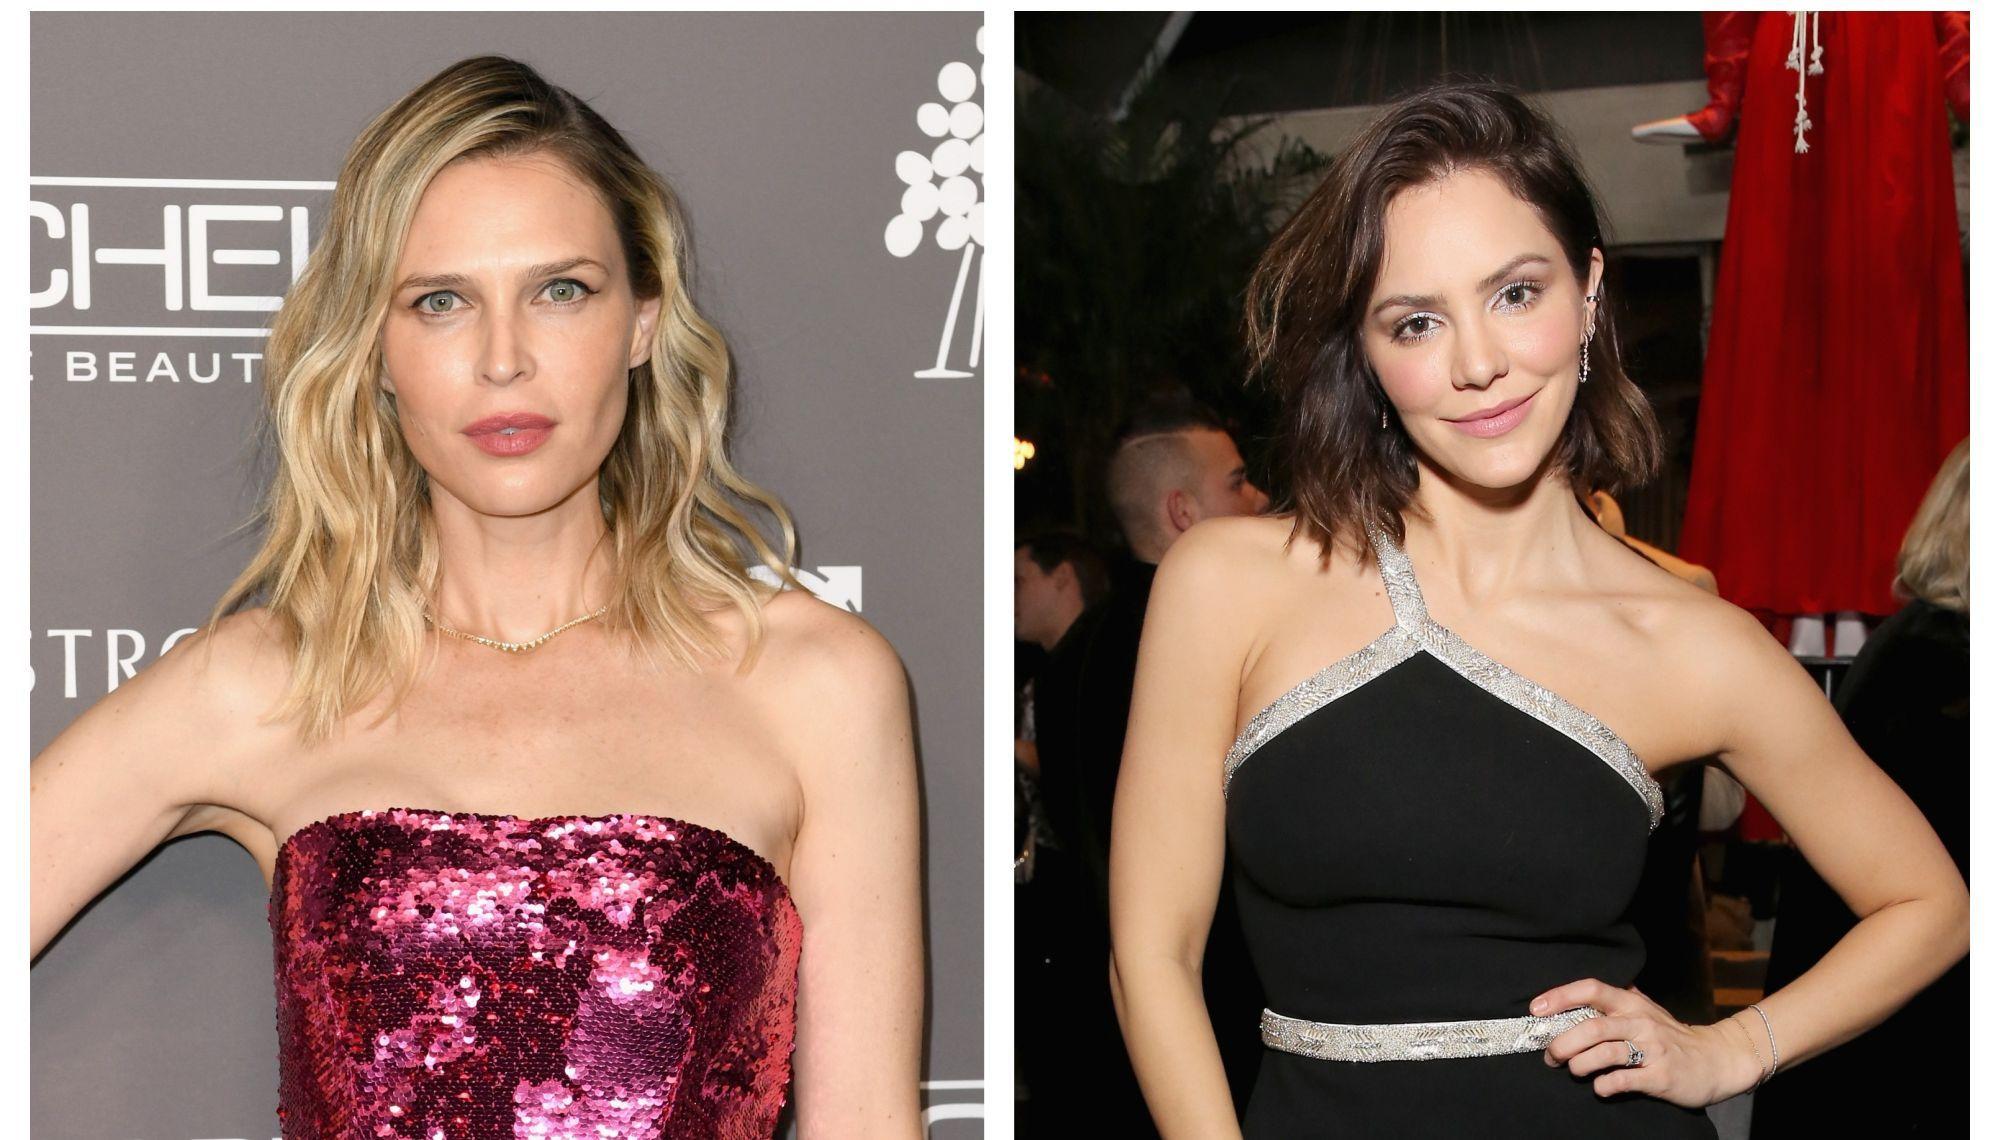 Sara Foster Teases Mom Katharine Mcphee Over Bikini Photo Dress Age Appropriately Bikini Photos Katharine Mcphee Bikinis